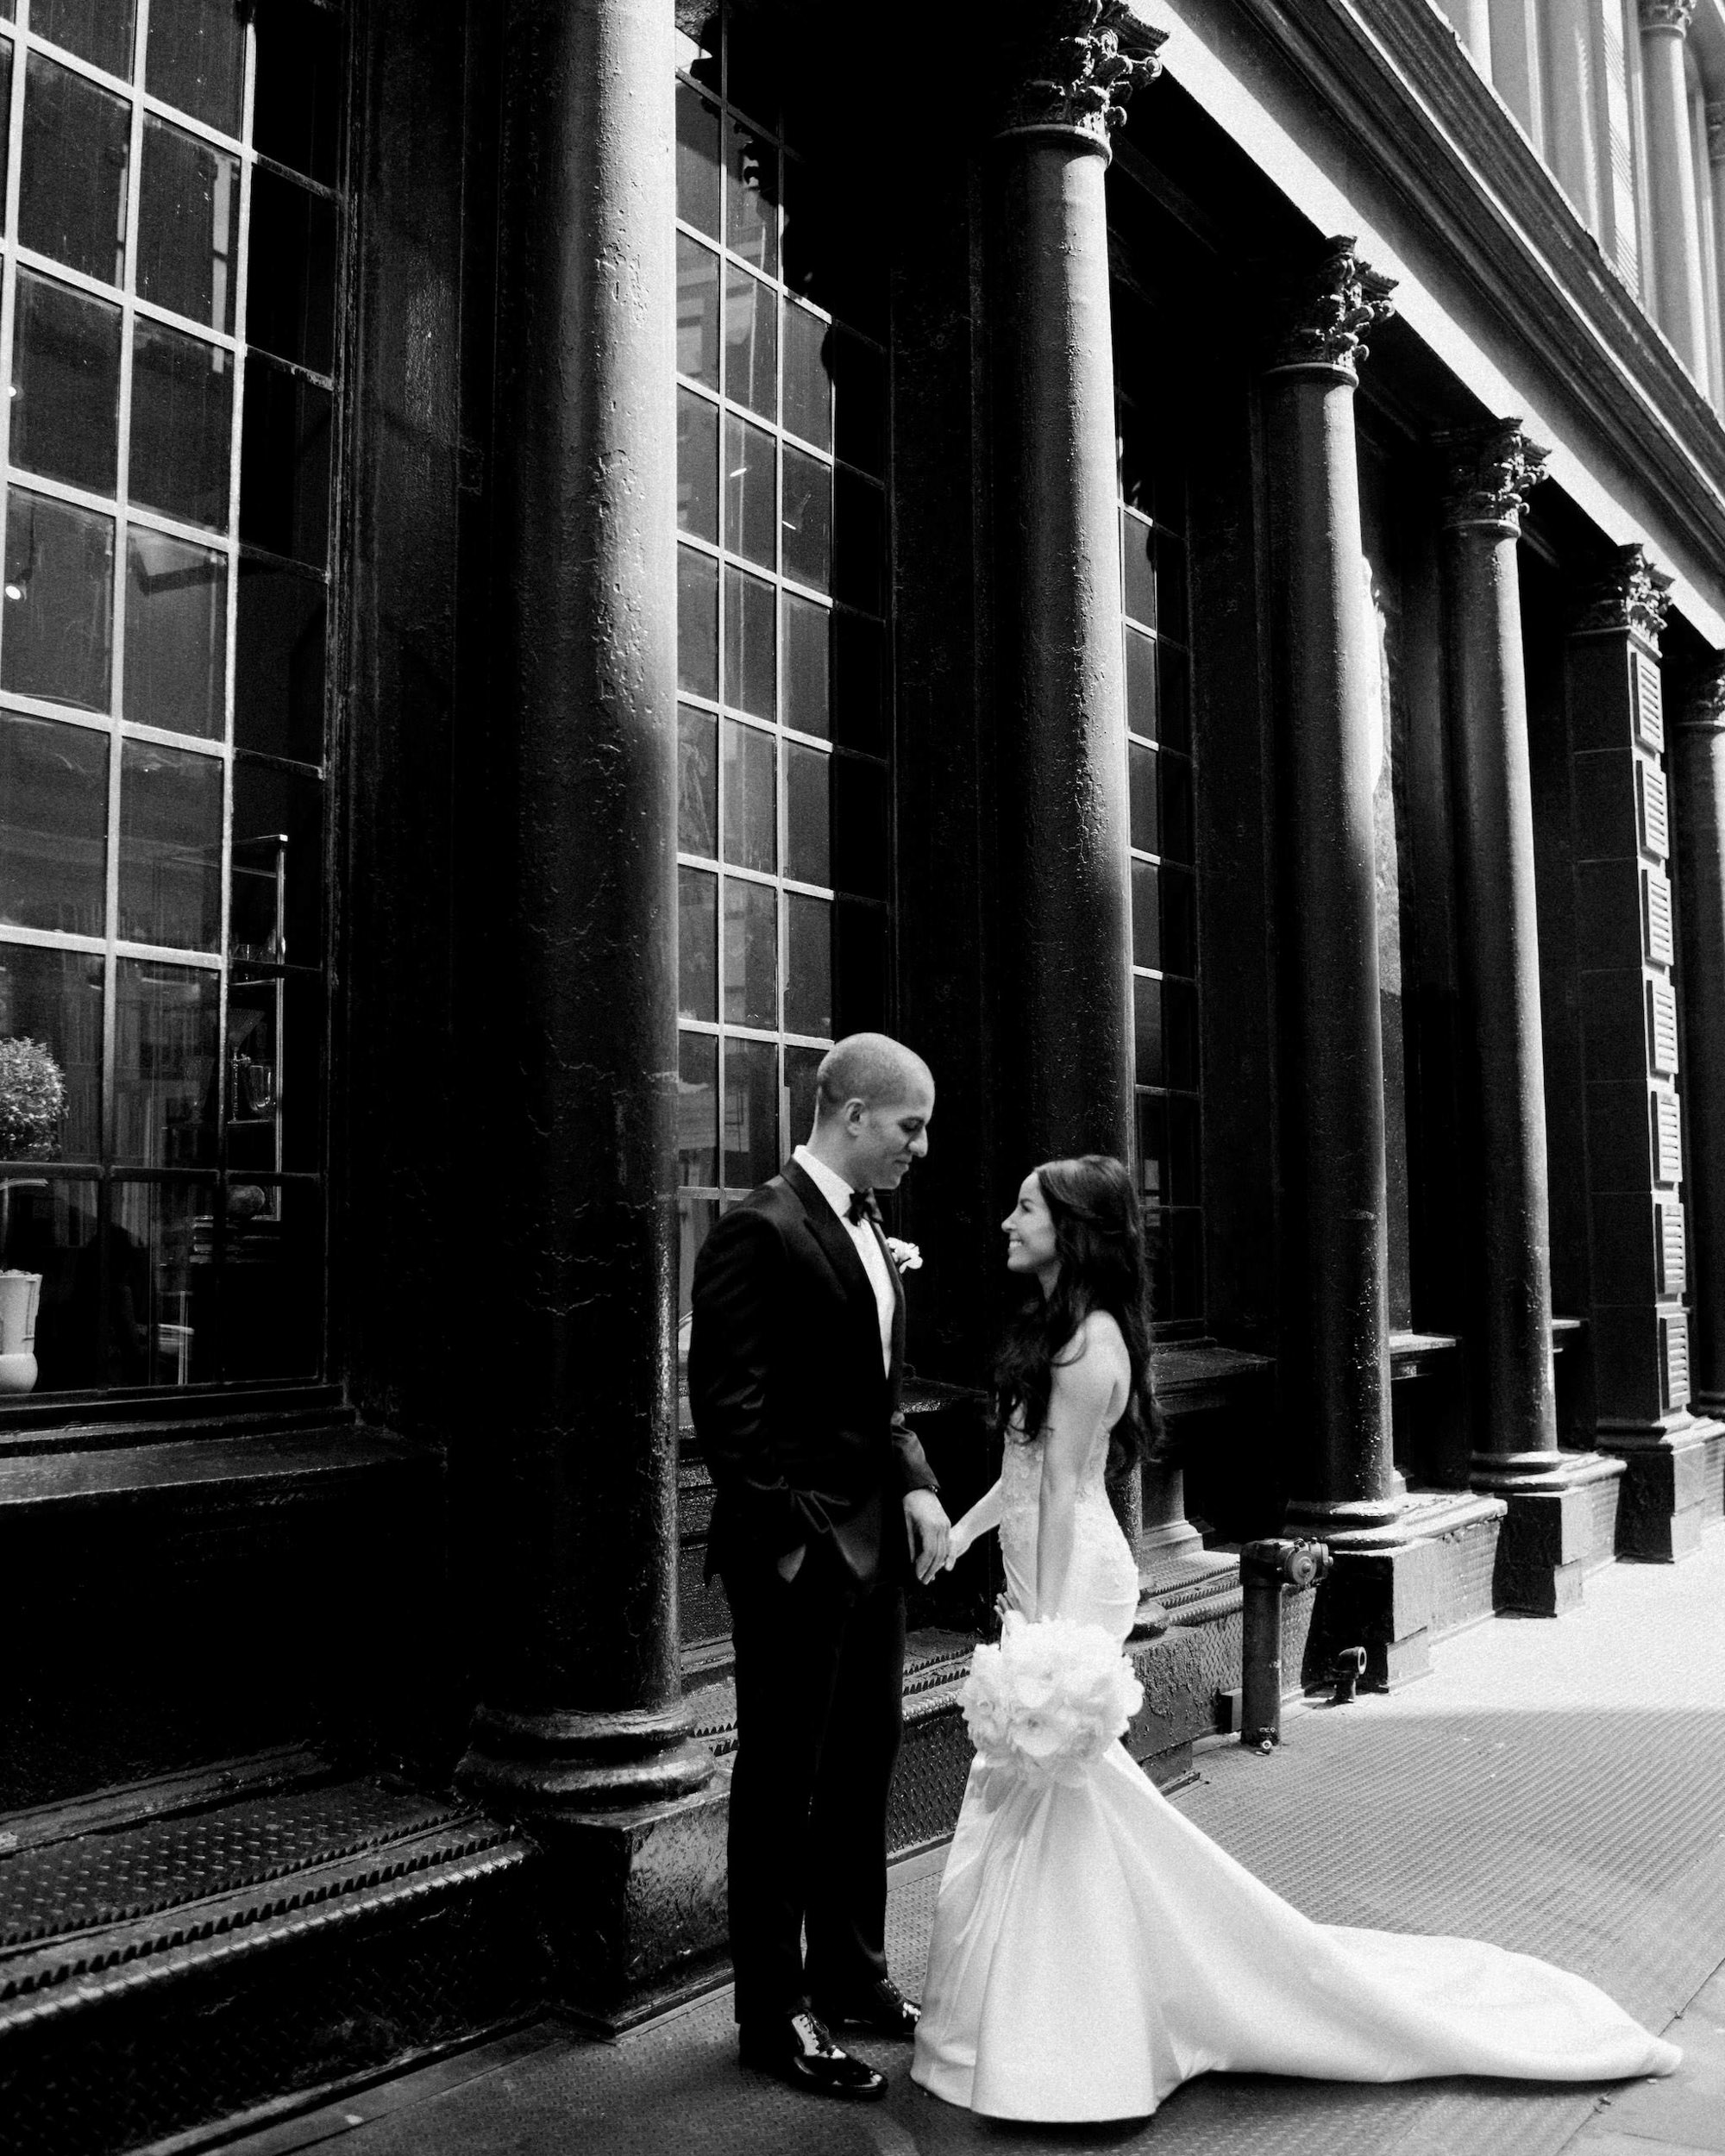 11 Howard Soho Wedding Photographer 23 - 11 Howard